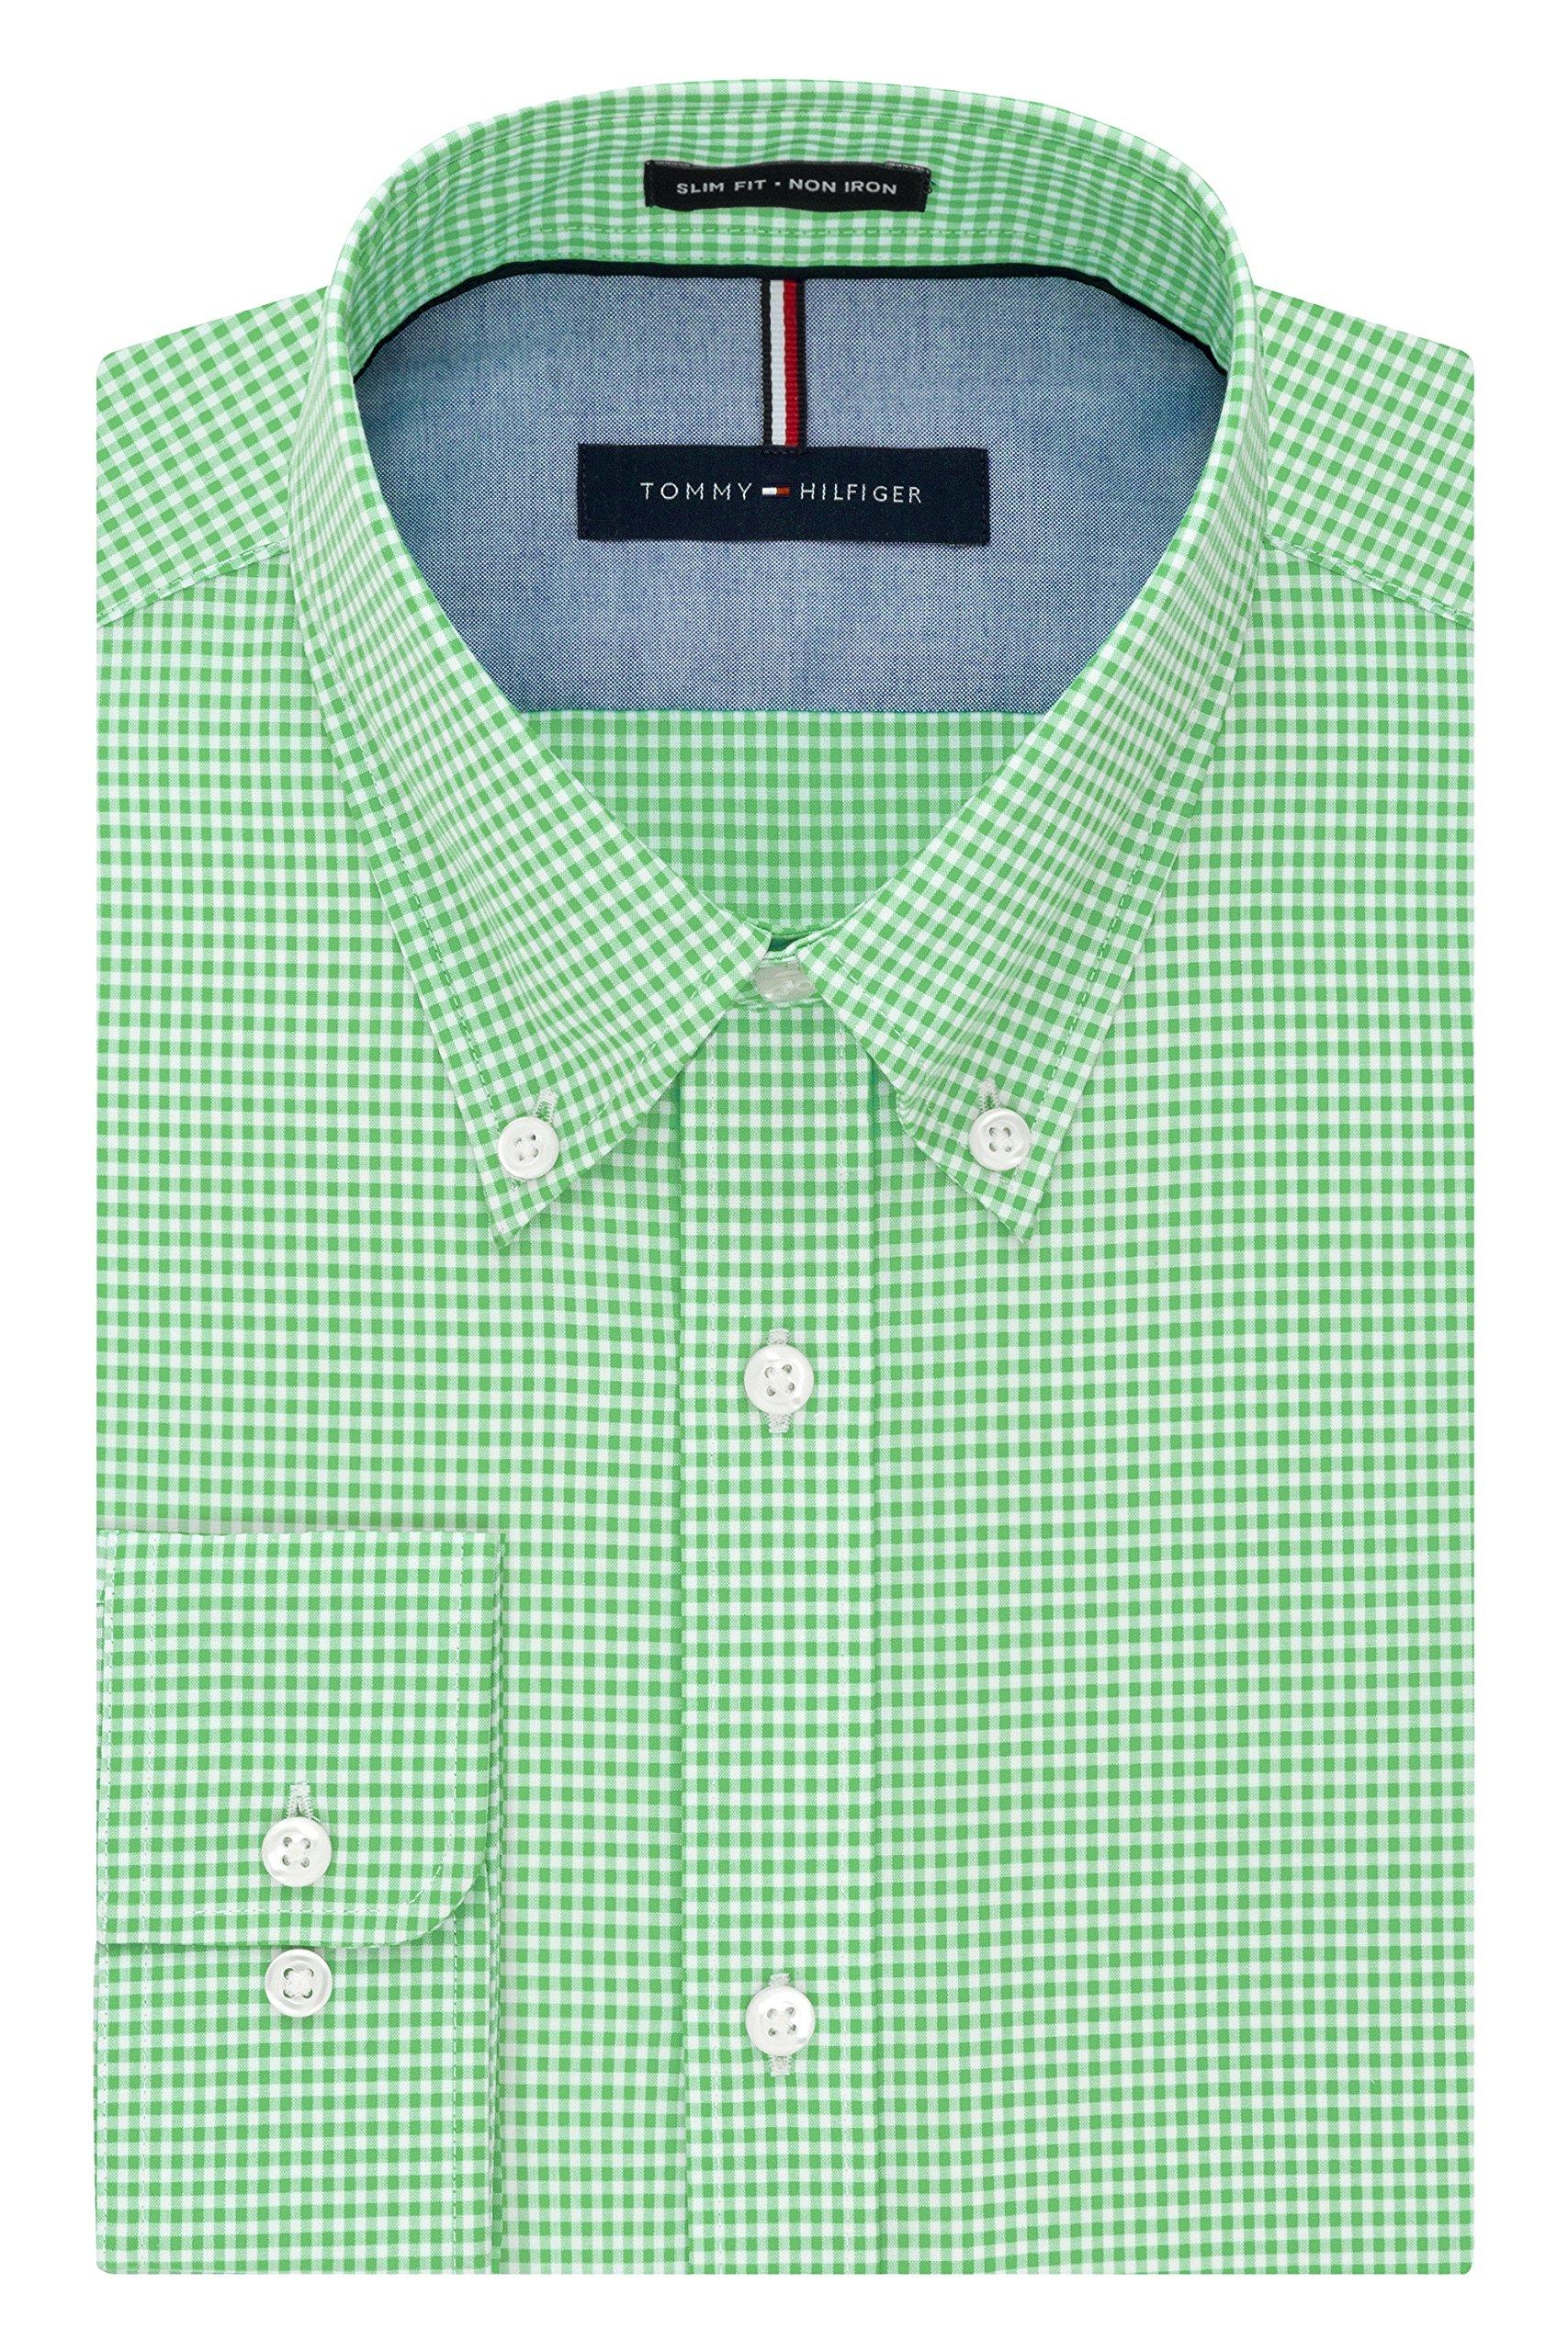 Tommy Hilfiger Men's Non Iron Slim Fit Gingham Buttondown Collar Dress Shirt, Sea Grass, 18.5'' Neck 34''-35'' Sleeve